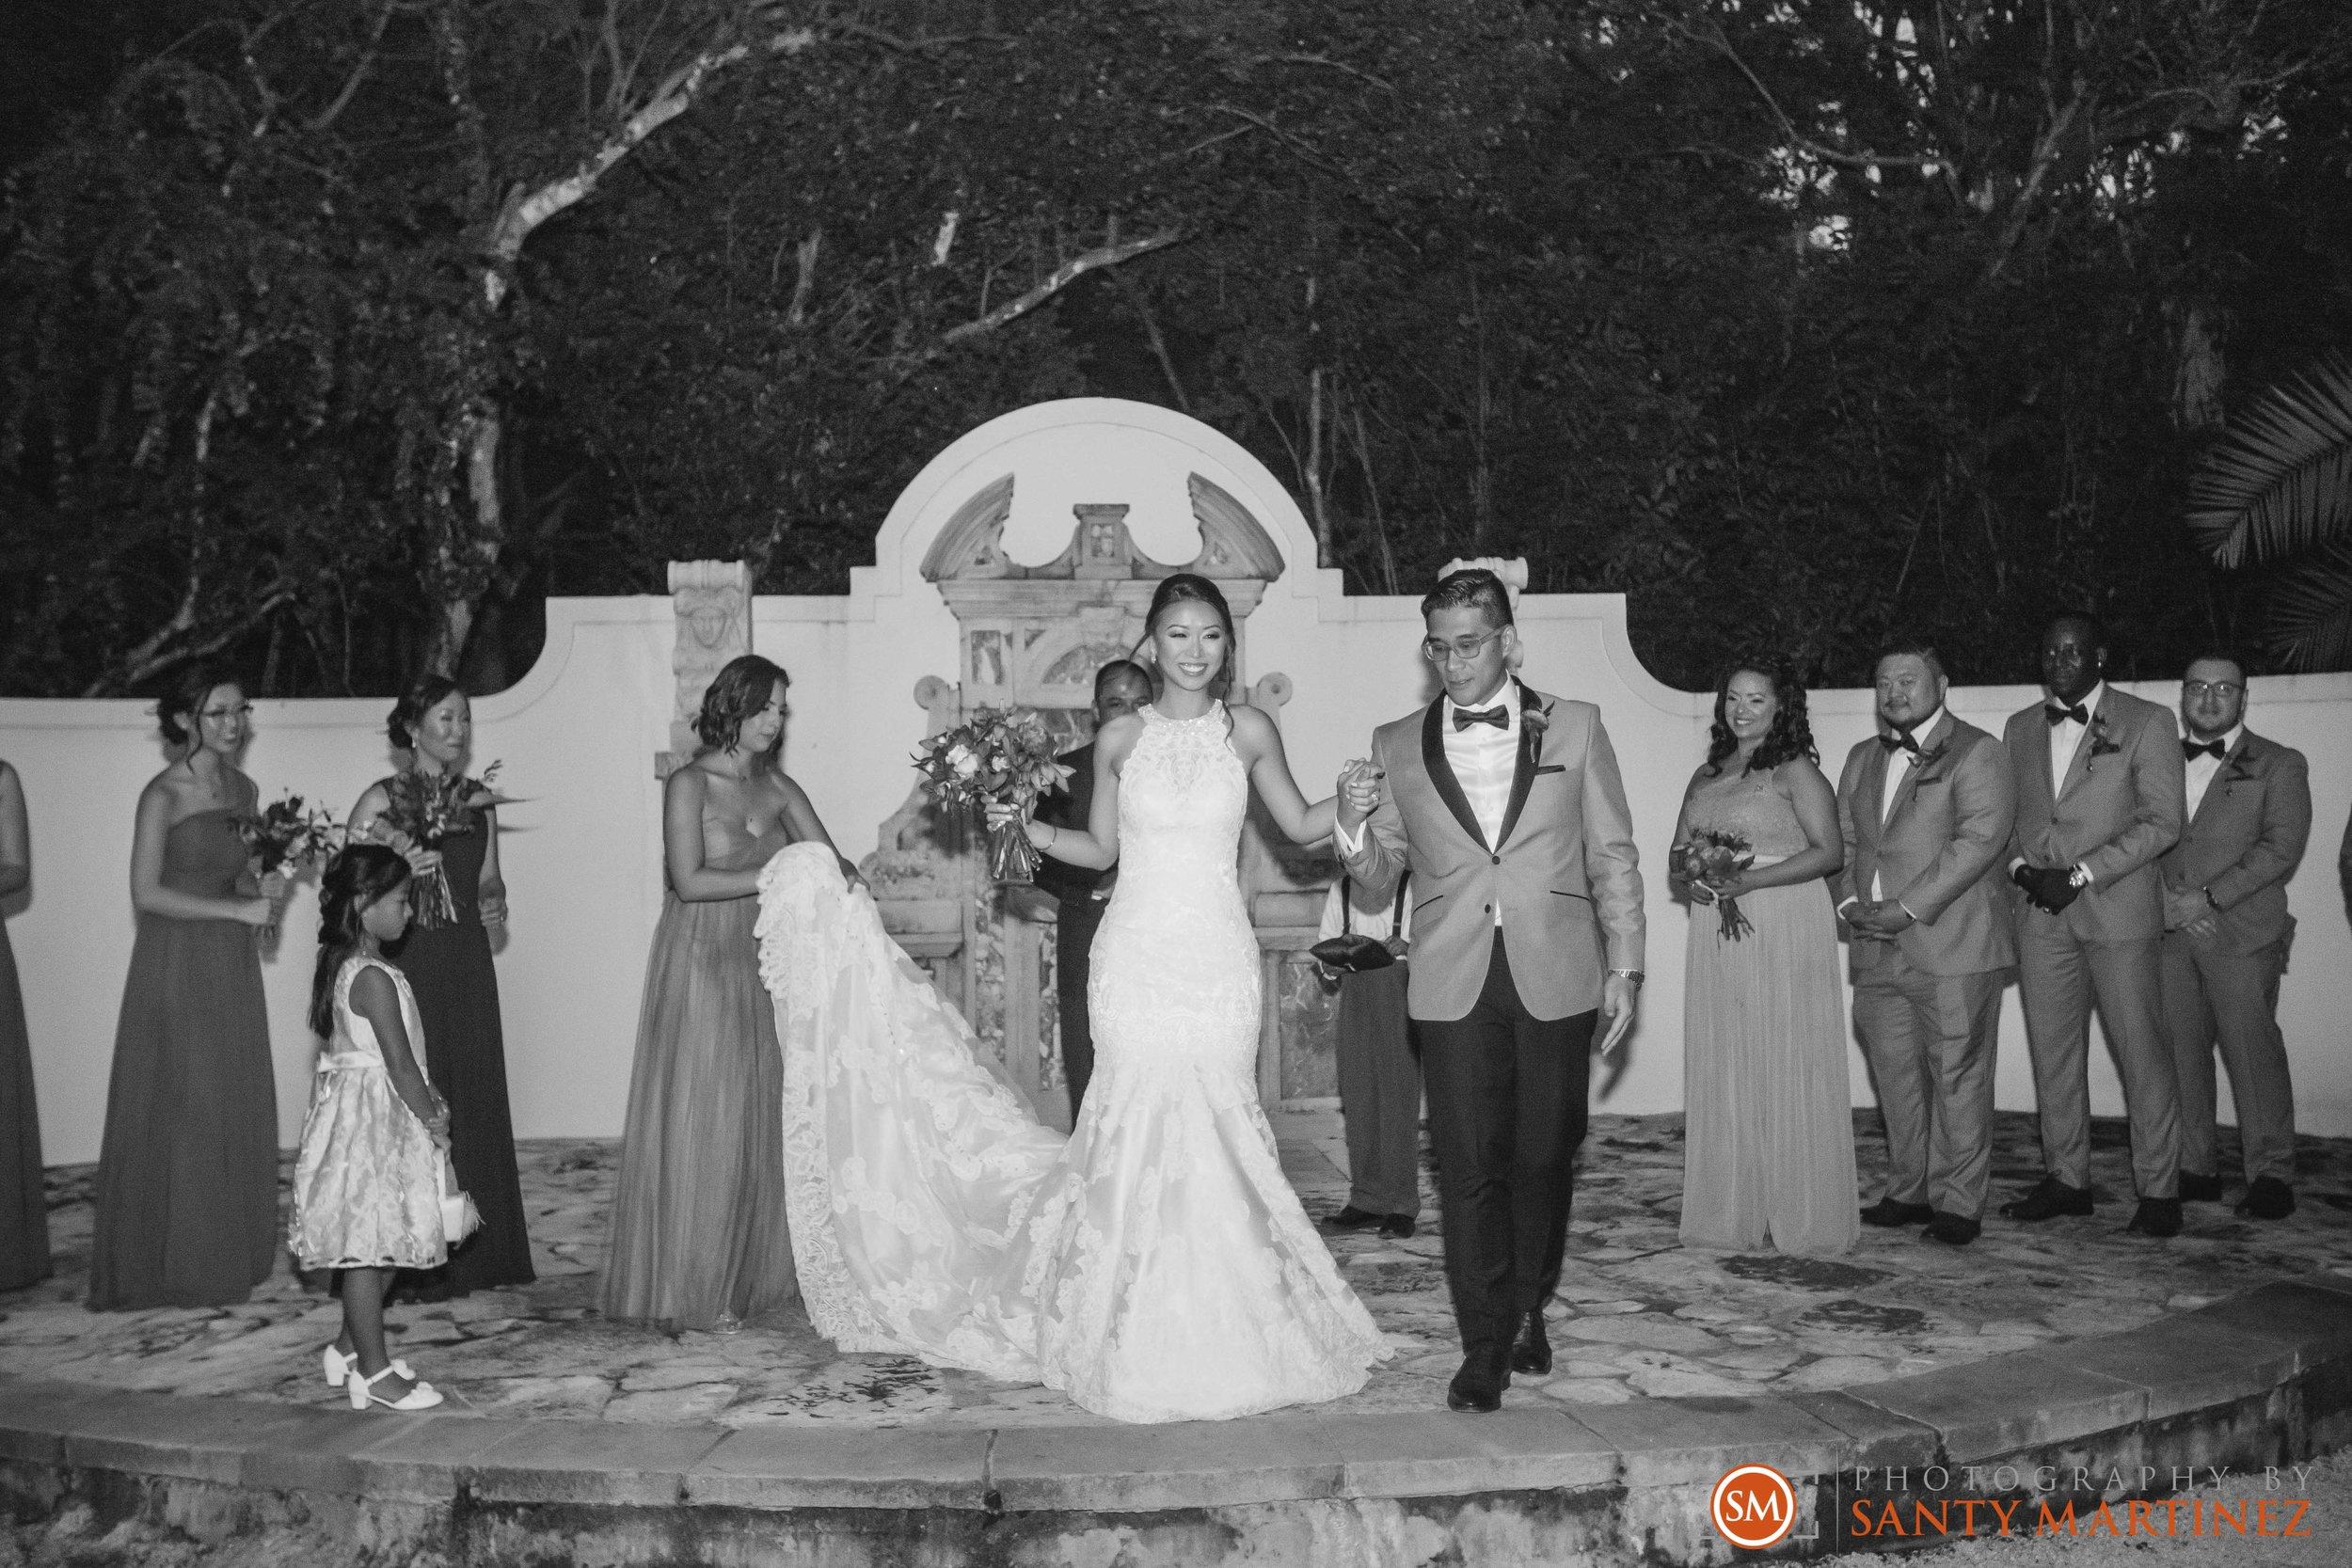 Wedding Bonnet House - Photography by Santy Martinez-29.jpg